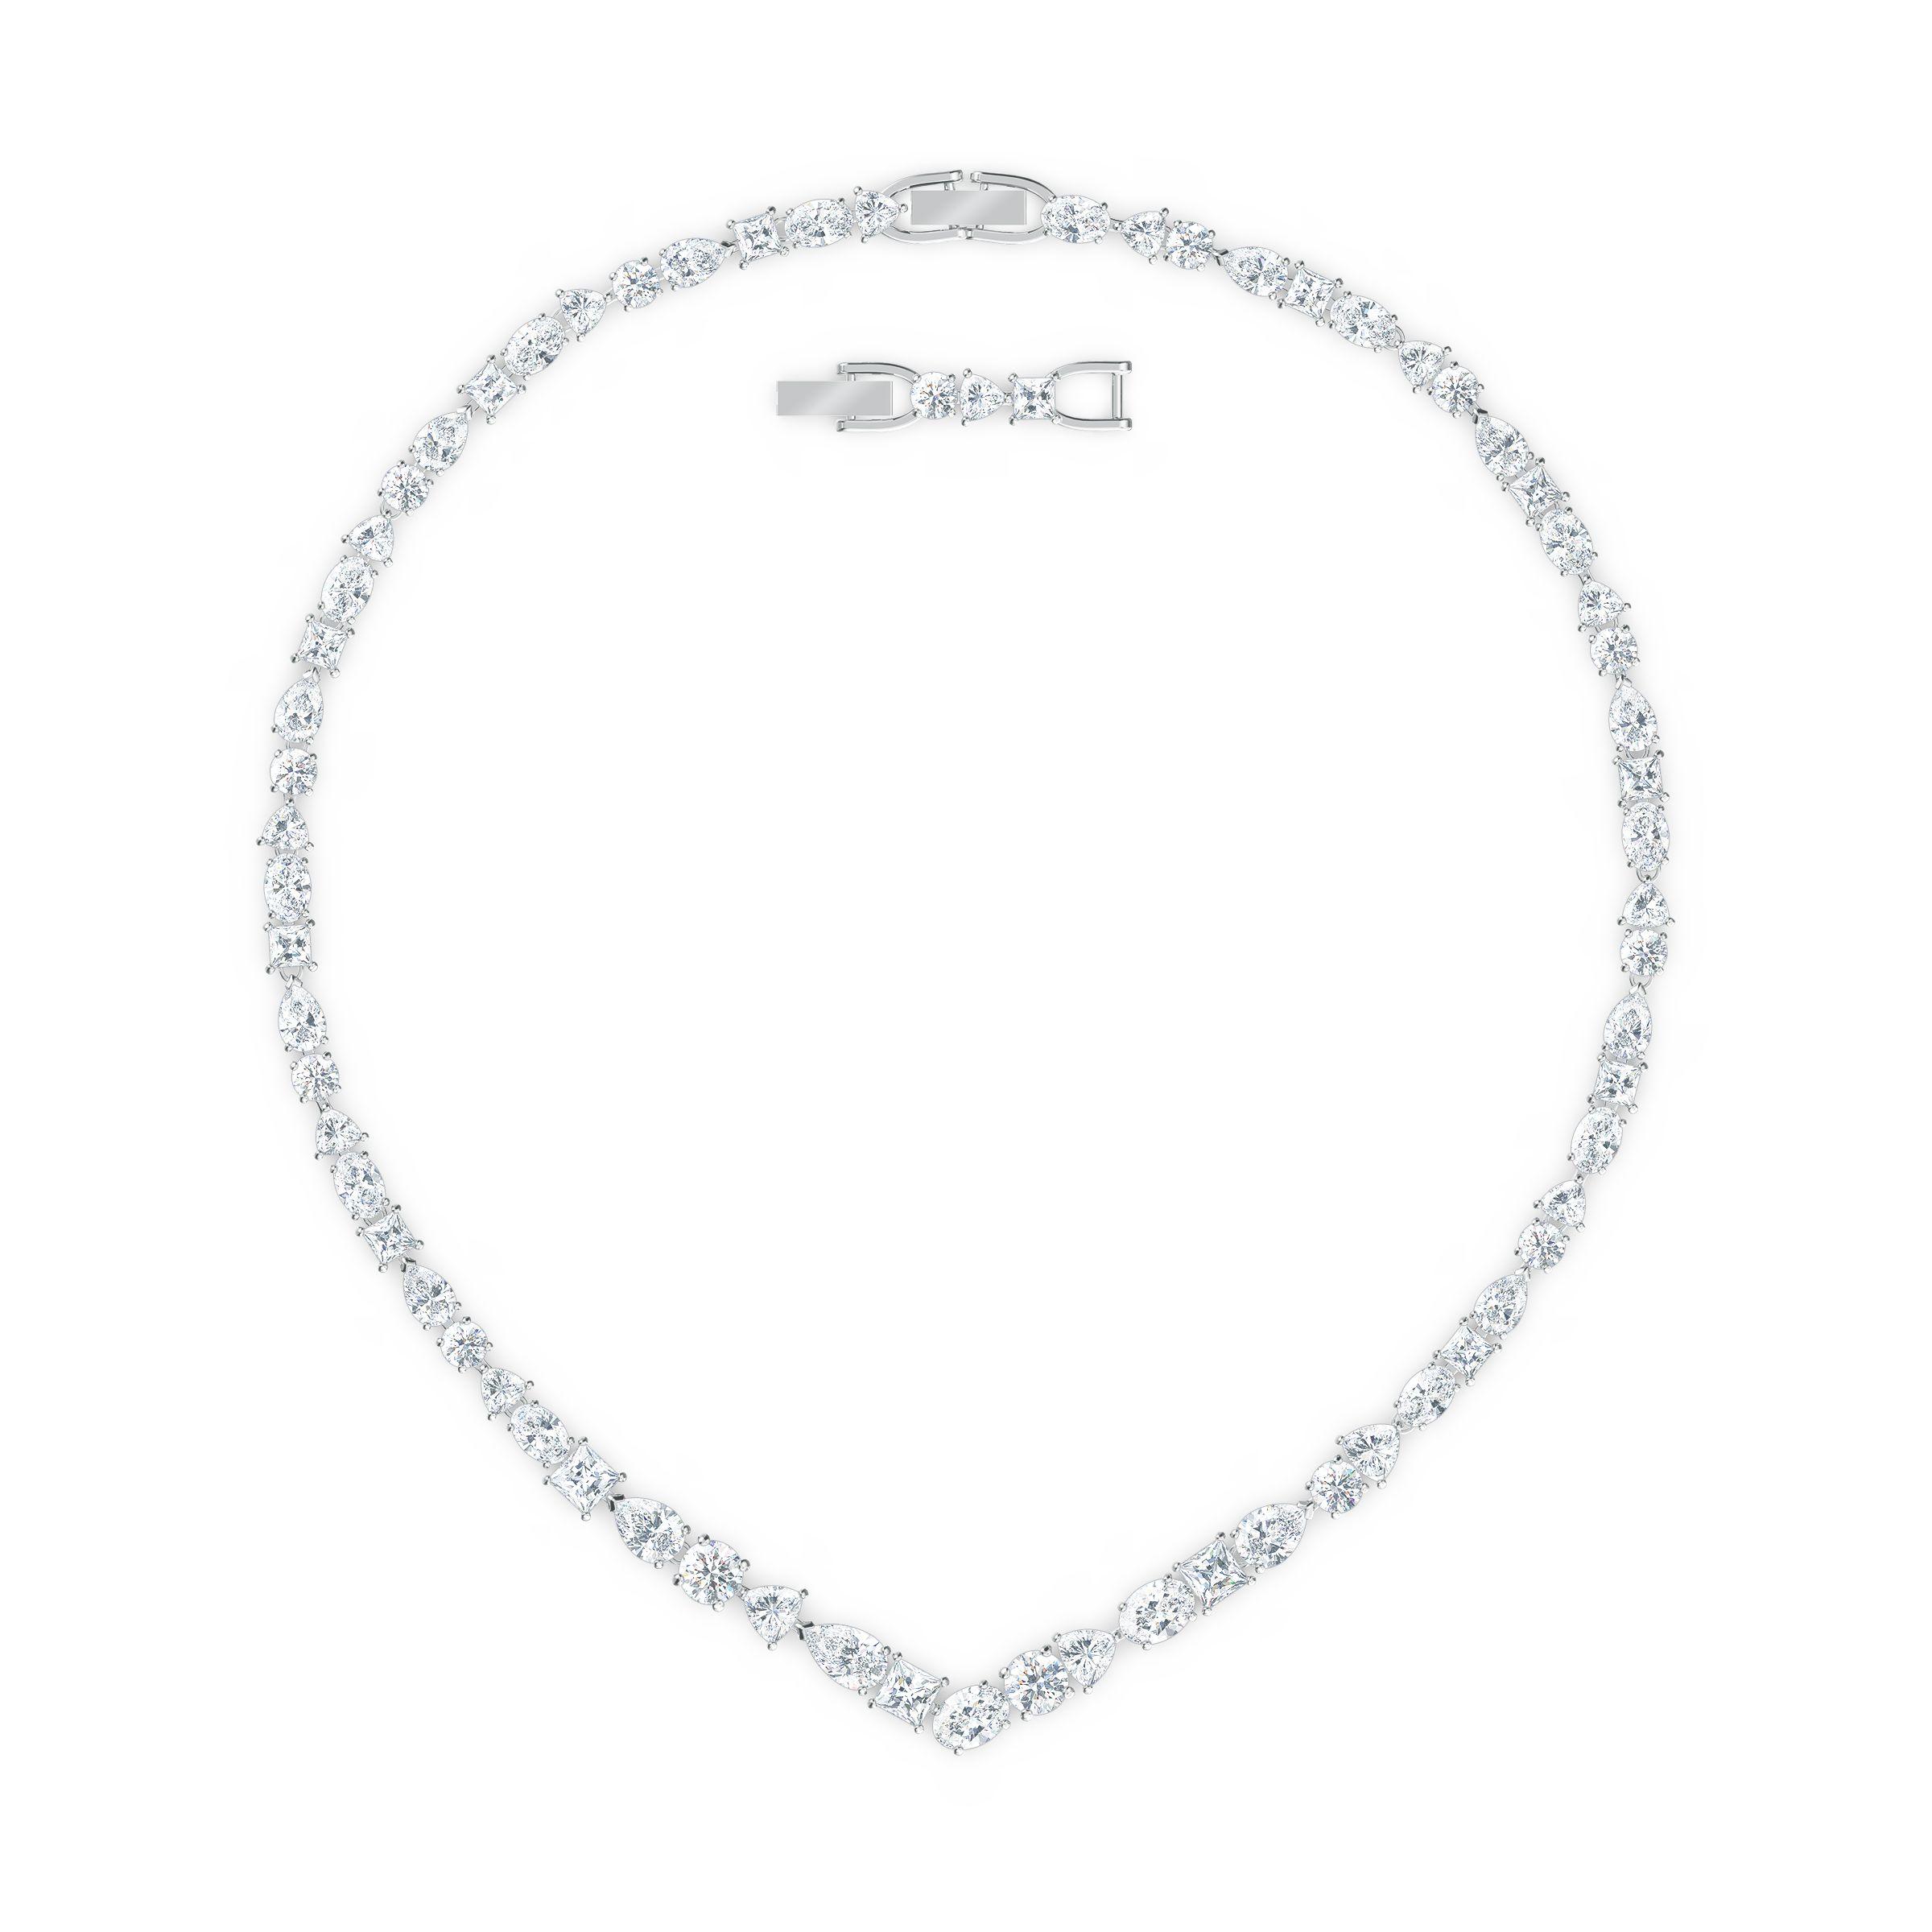 Collier en V Tennis Deluxe Mixed, blanc, métal rhodié, Swarovski